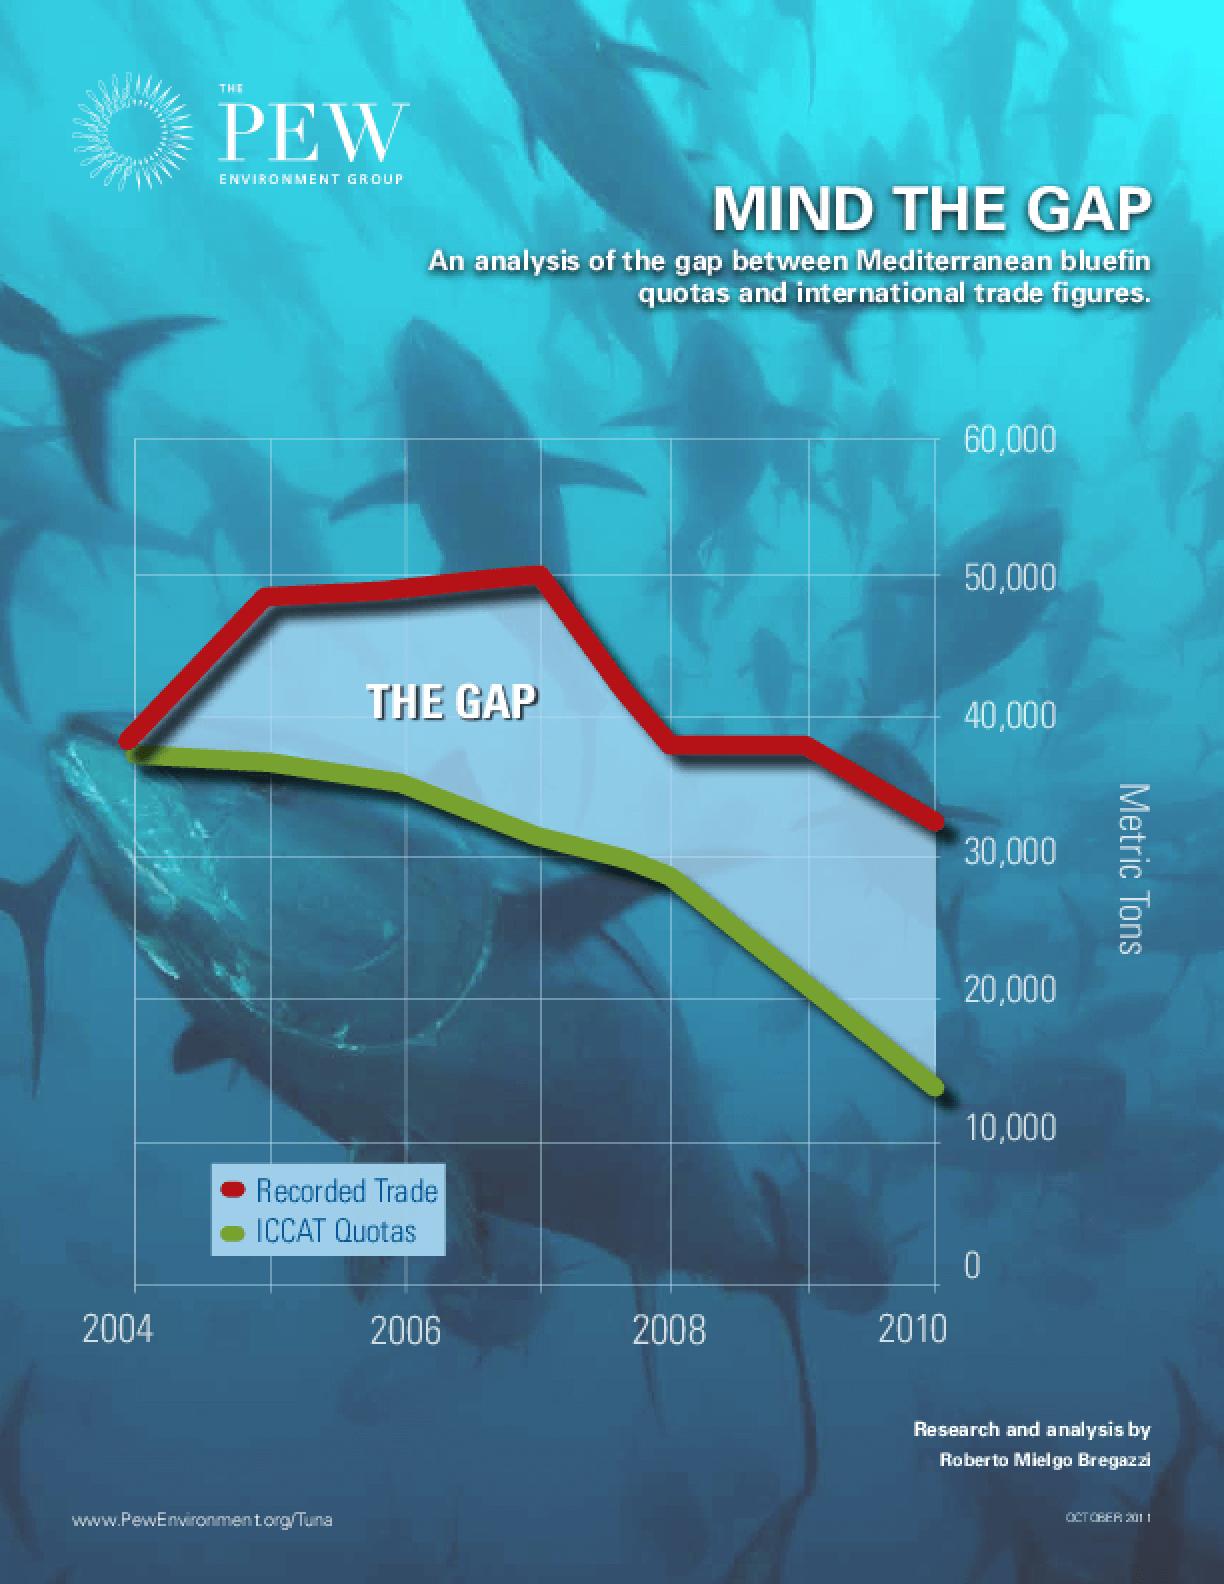 Mind the Gap: An Analysis of the Mediterranean Bluefin Trade